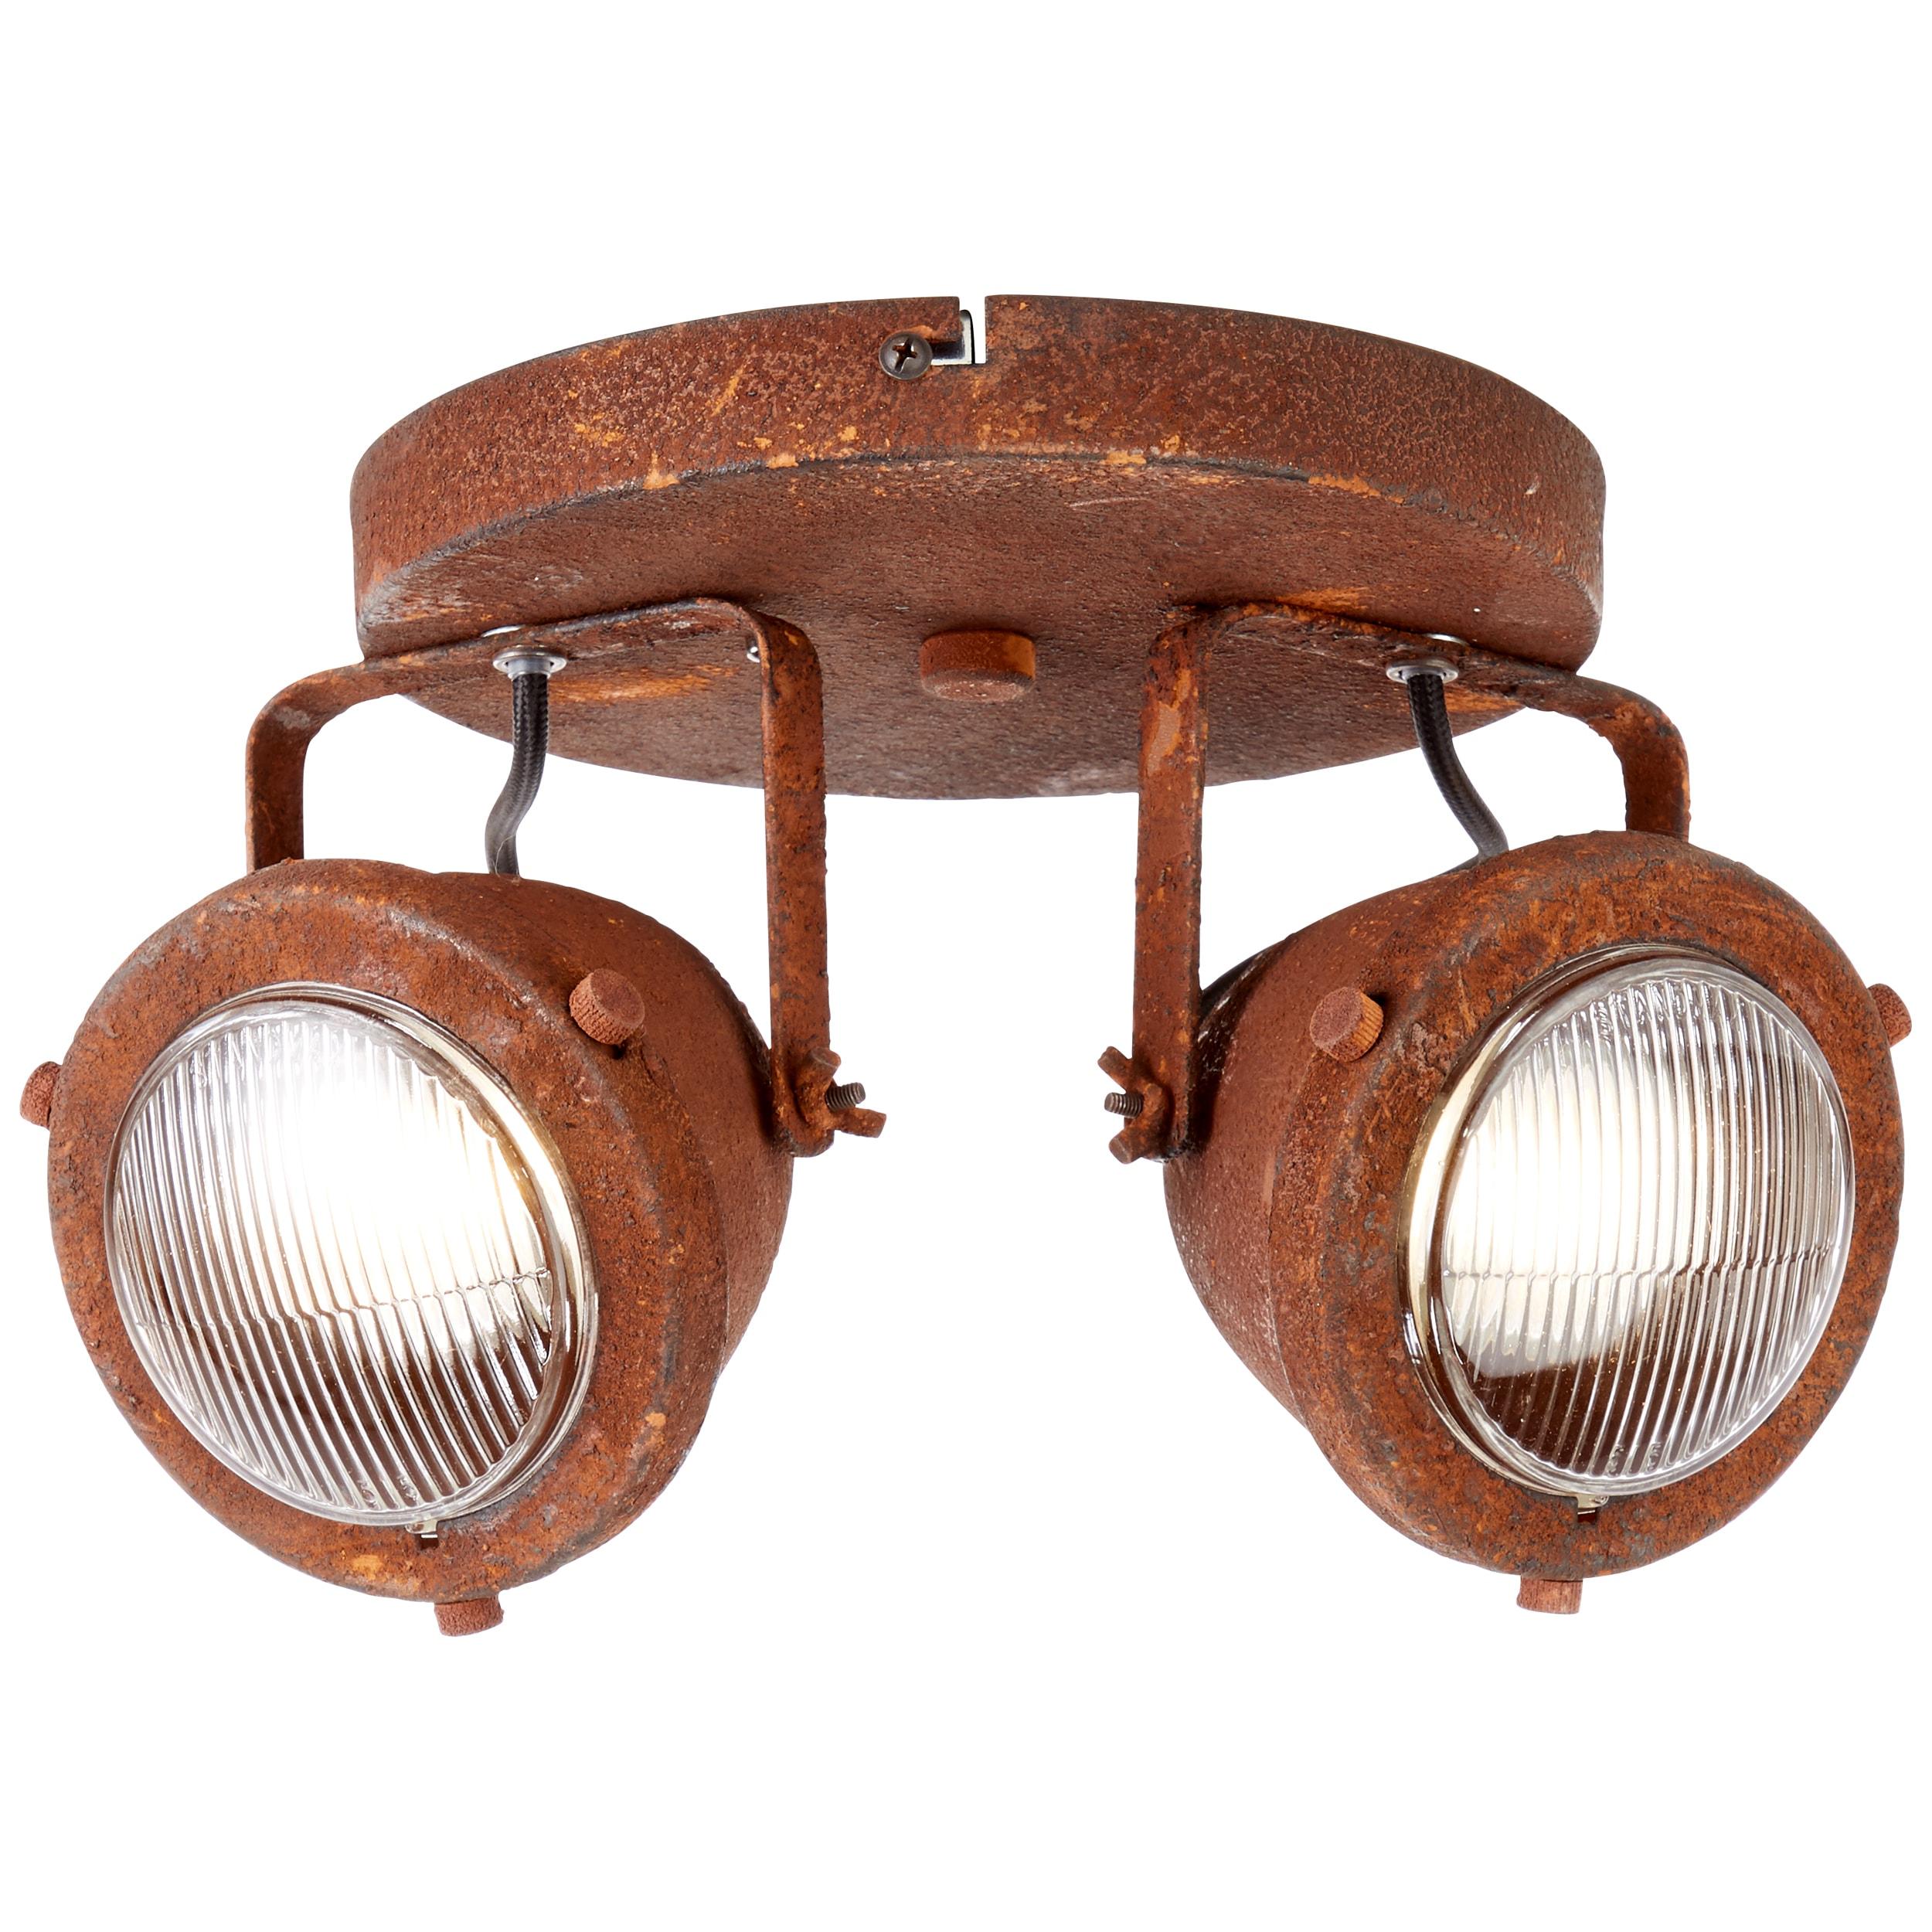 Brilliant Leuchten Carmen LED Spotrondell 2flg rostfarbend